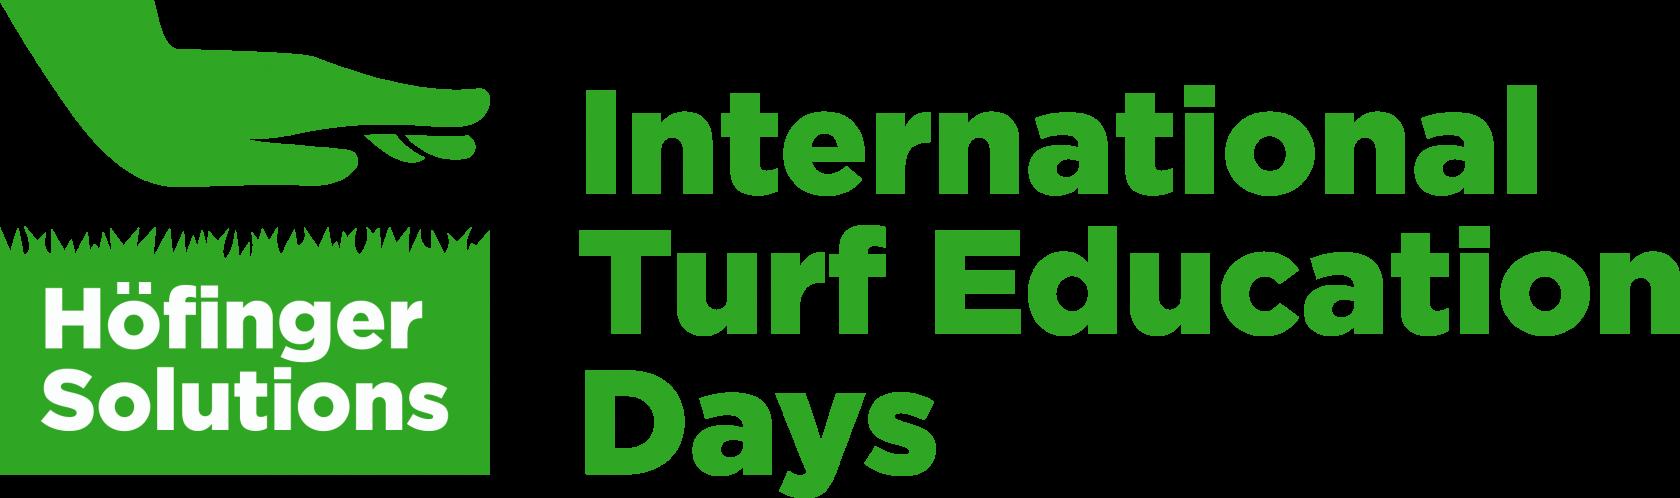 INTERNATIONAL TURF EDUCATION DAYS